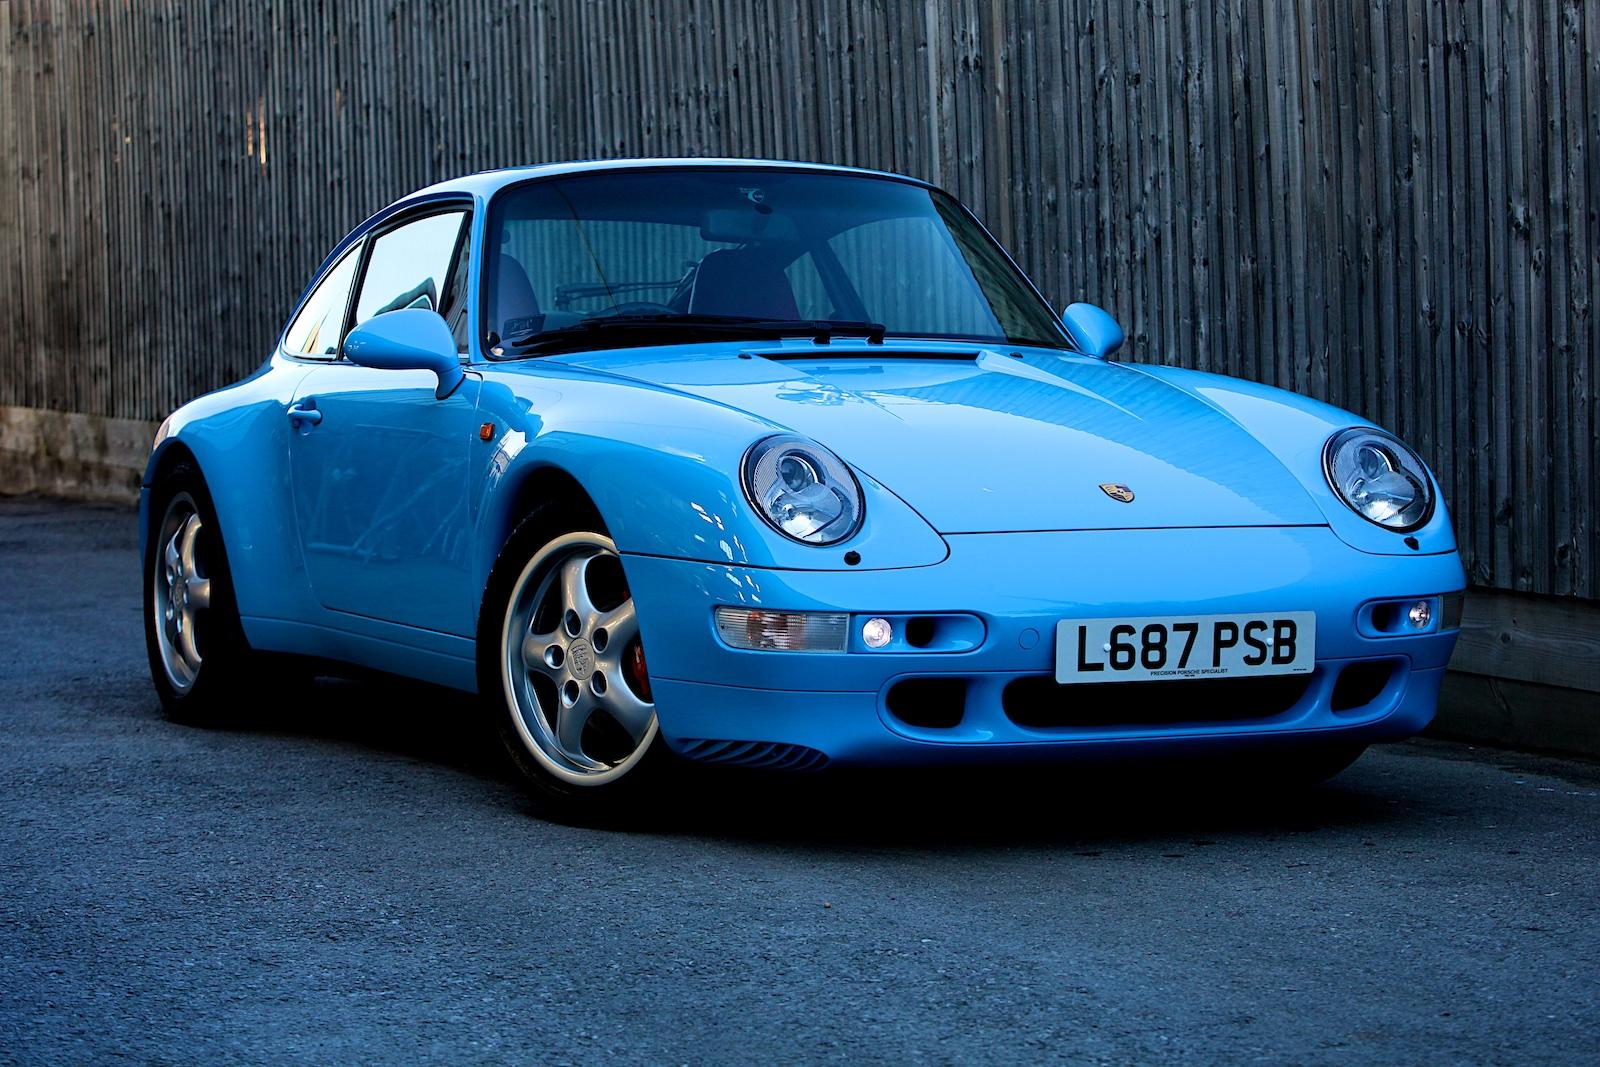 Resprayed Porsche 993 Riviera Blue Coupe